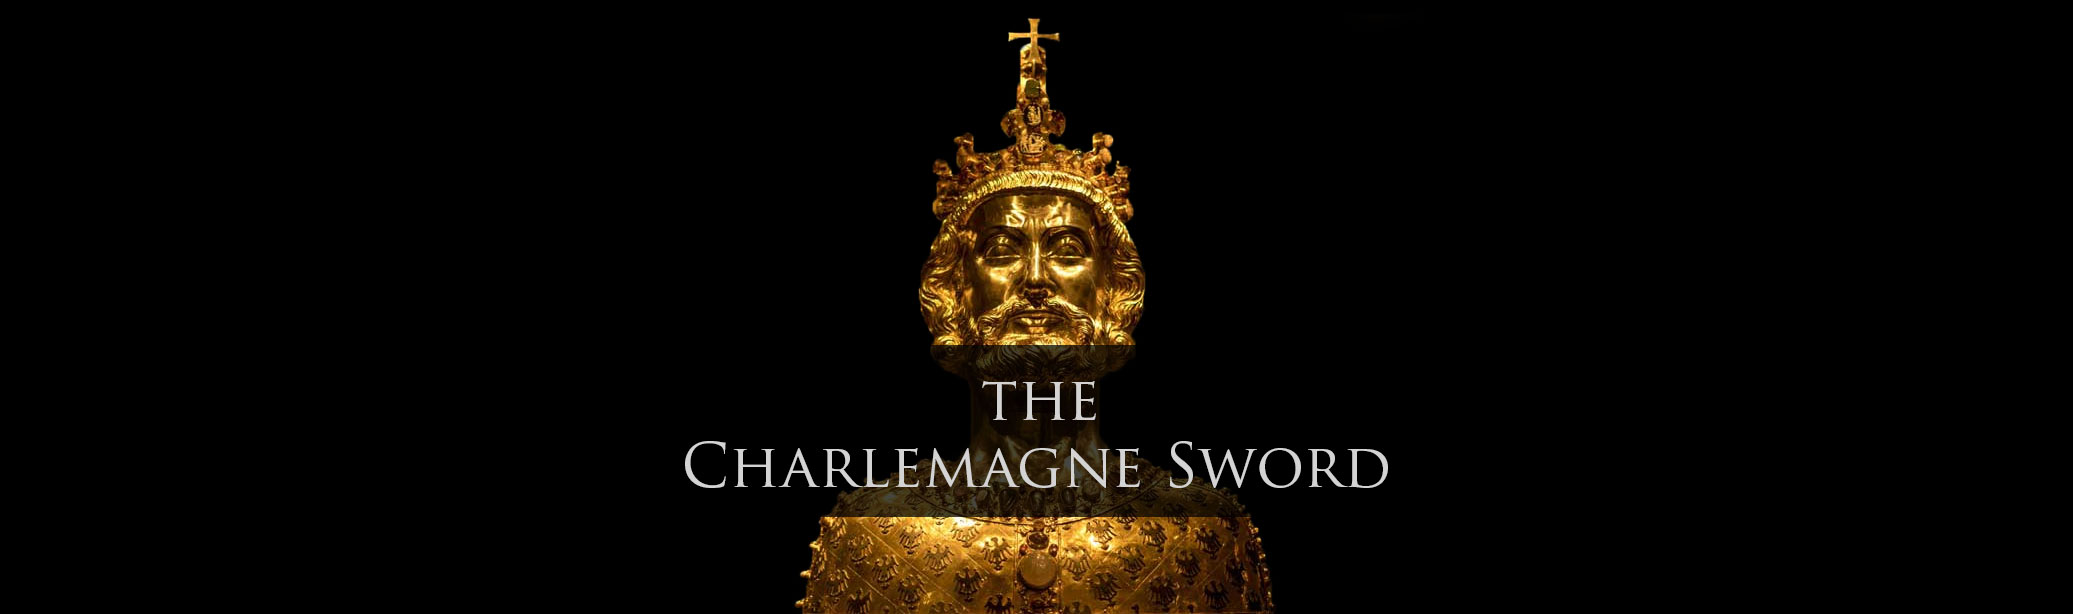 the-charlemagne-sword-banner-3